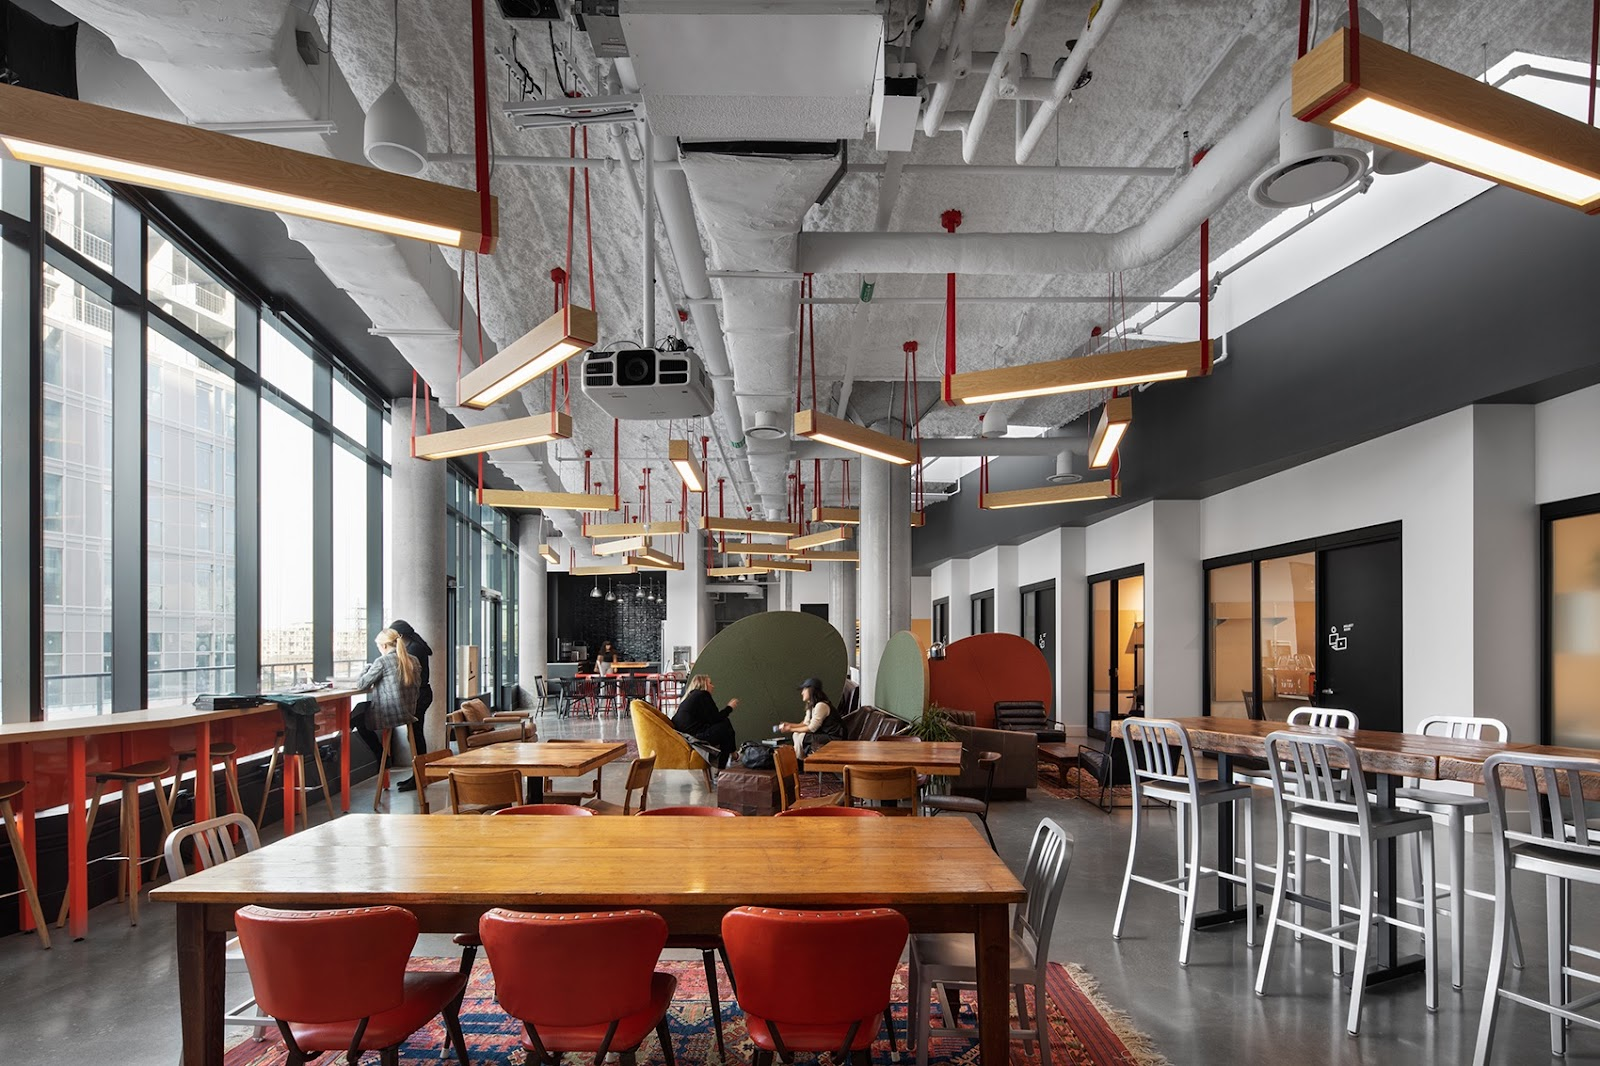 Artscape Daniels Launchpad Coworking Space in Toronto